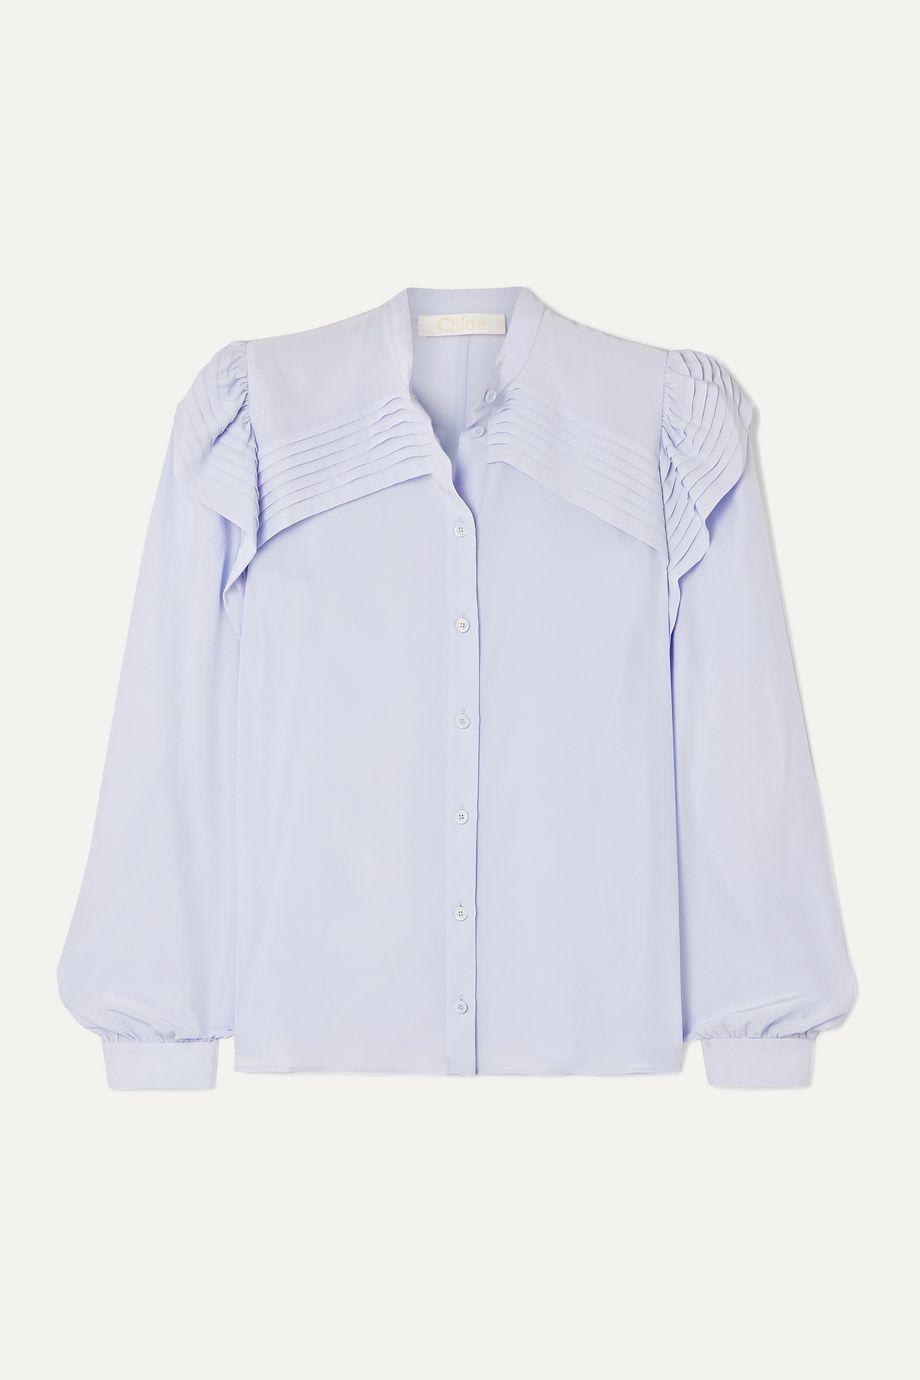 Chloé Ruffled silk crepe de chine blouse